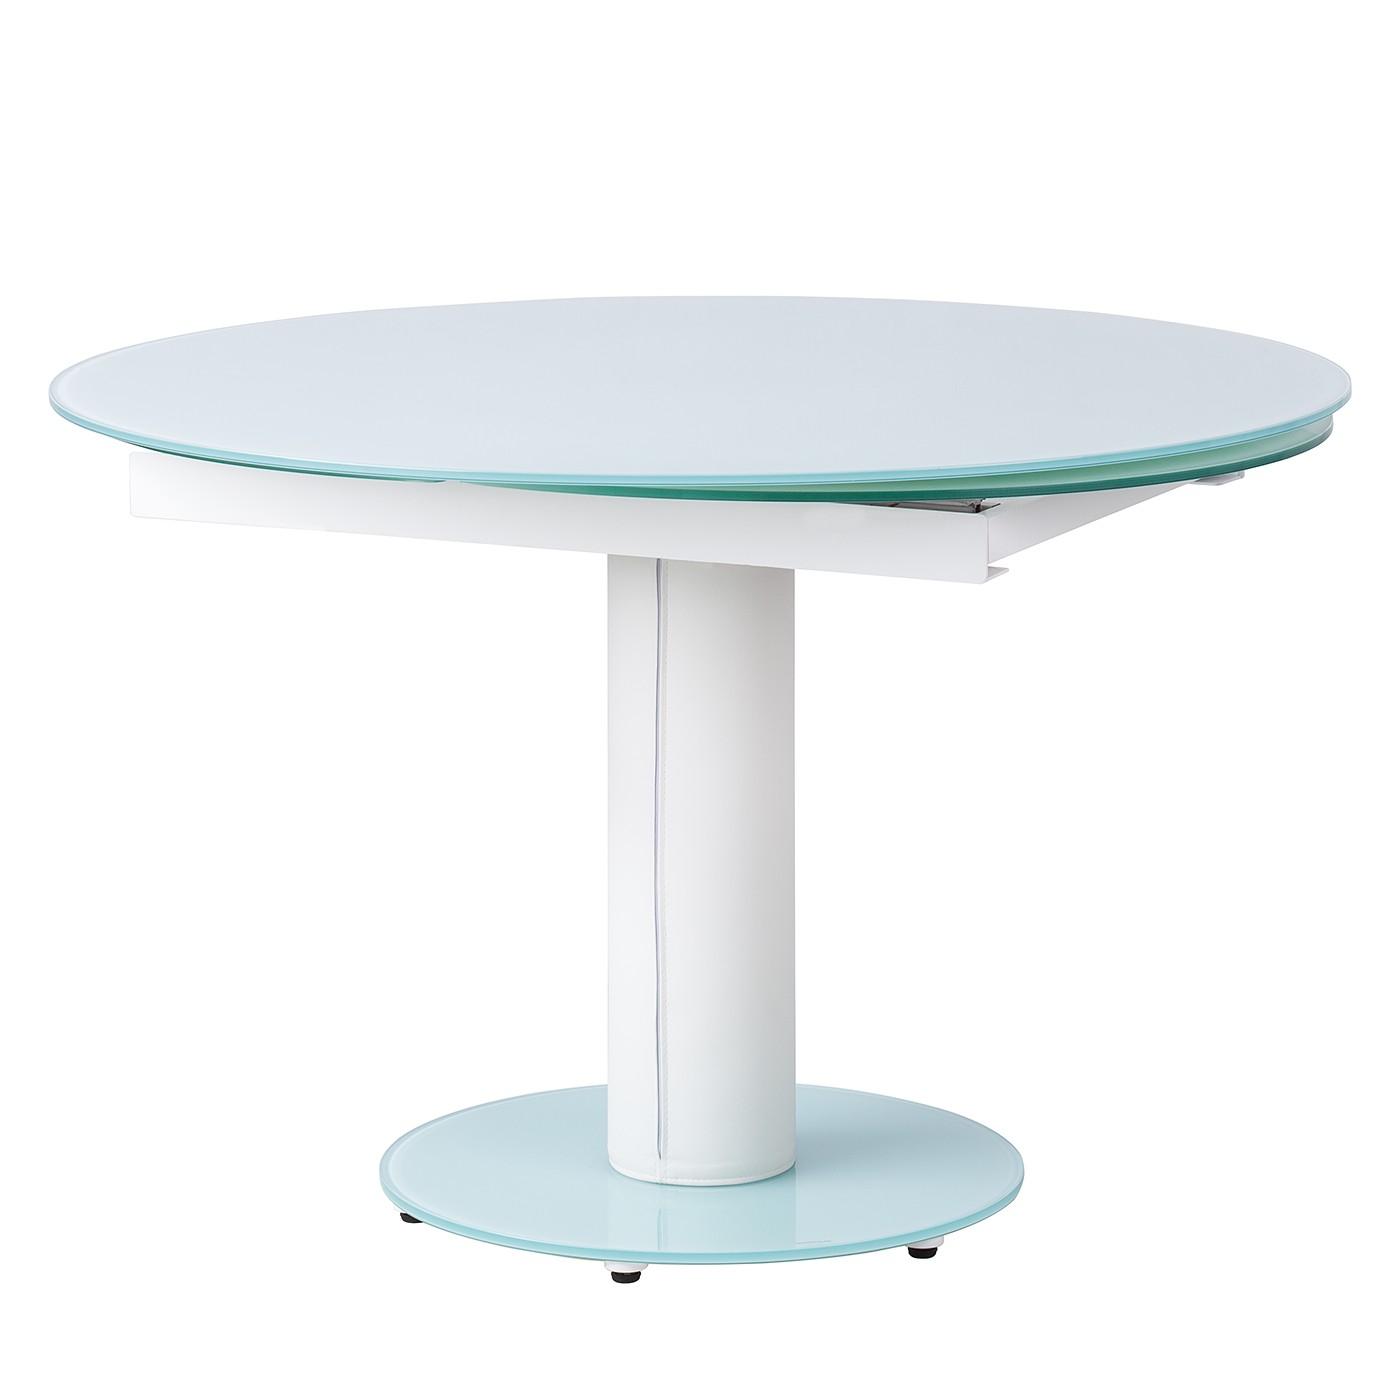 Table à manger Torgo (avec rallonge) - Verre / Imitation cuir - Blanc, Studio Copenhagen